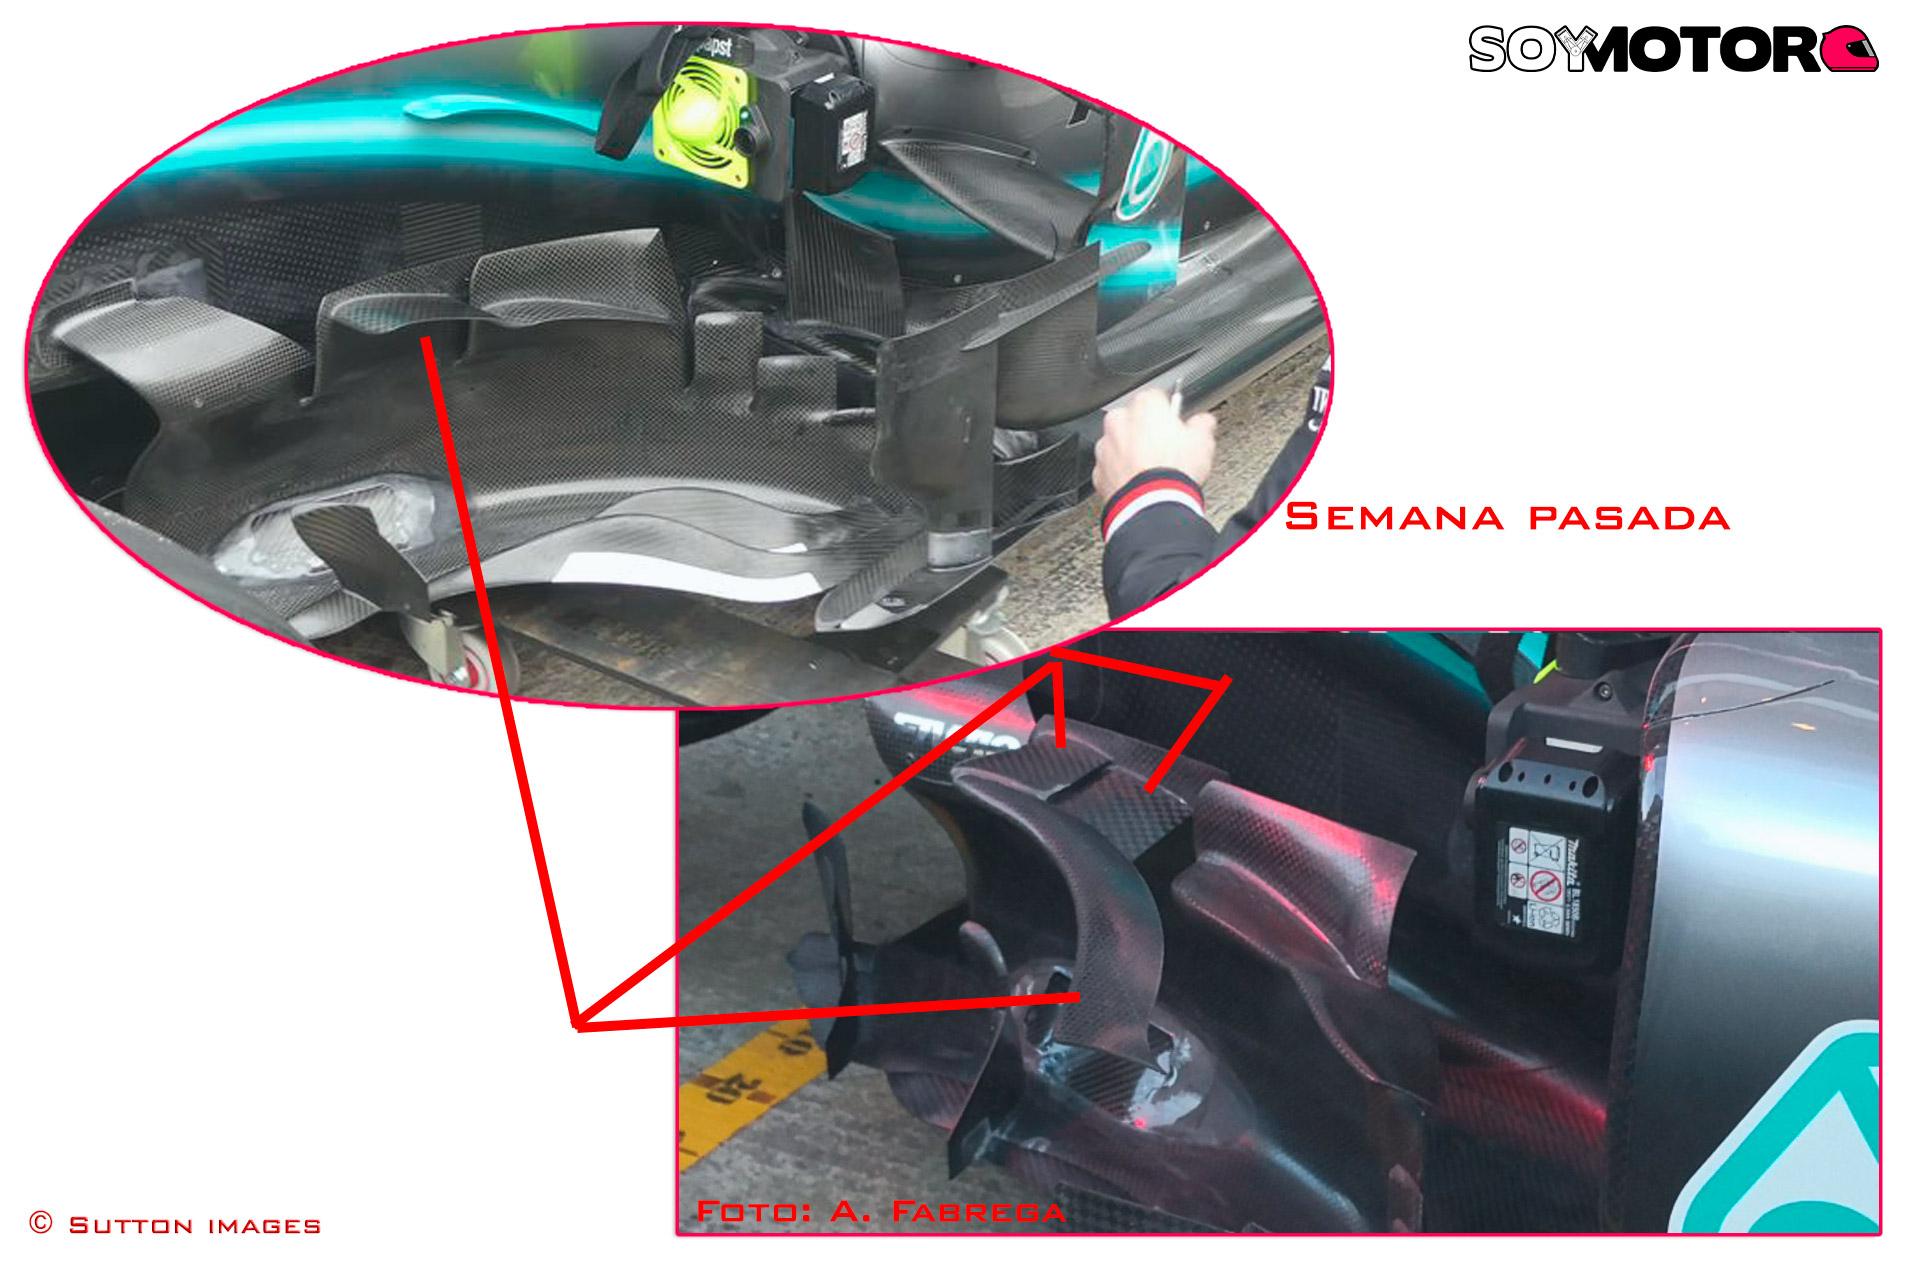 mercedes-nuevo-bargeboard-1-soymotor.jpg